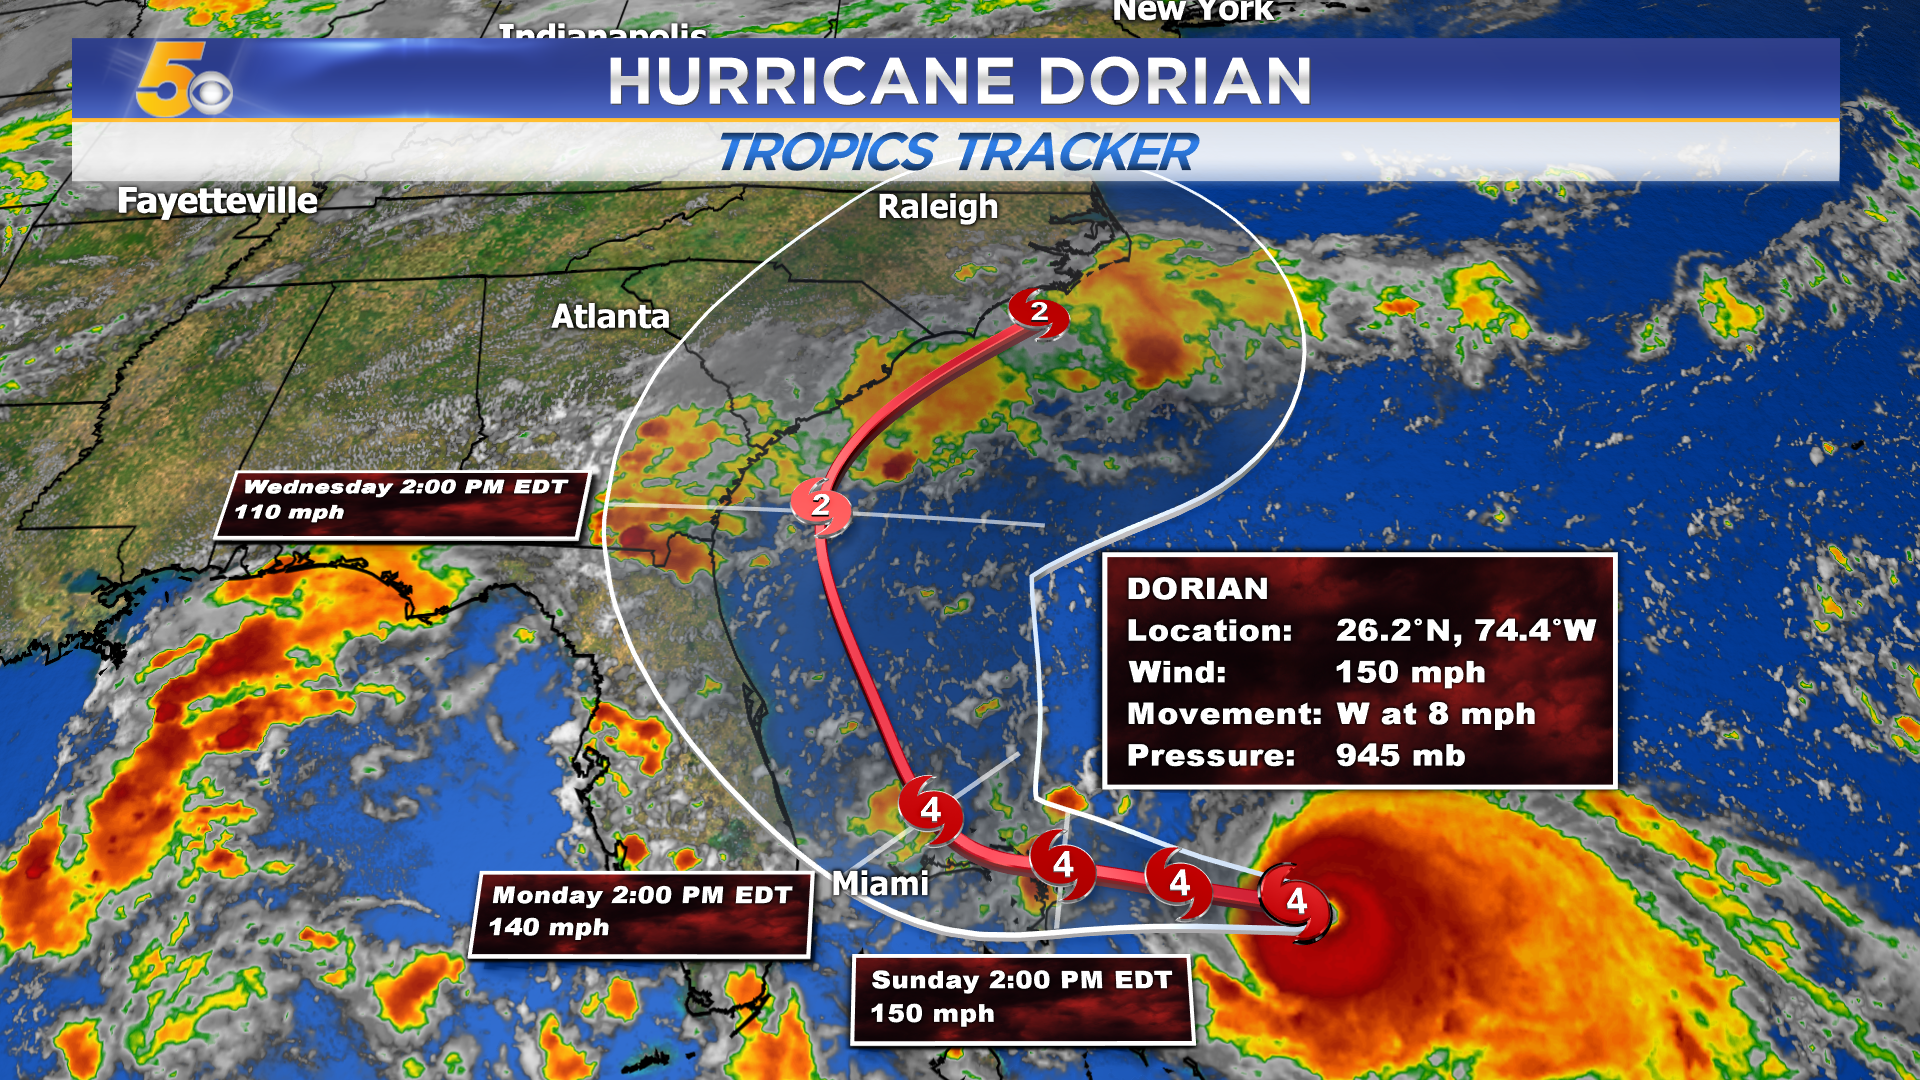 Latest On Hurricane Dorian: Major Storm But Landfall Unclear